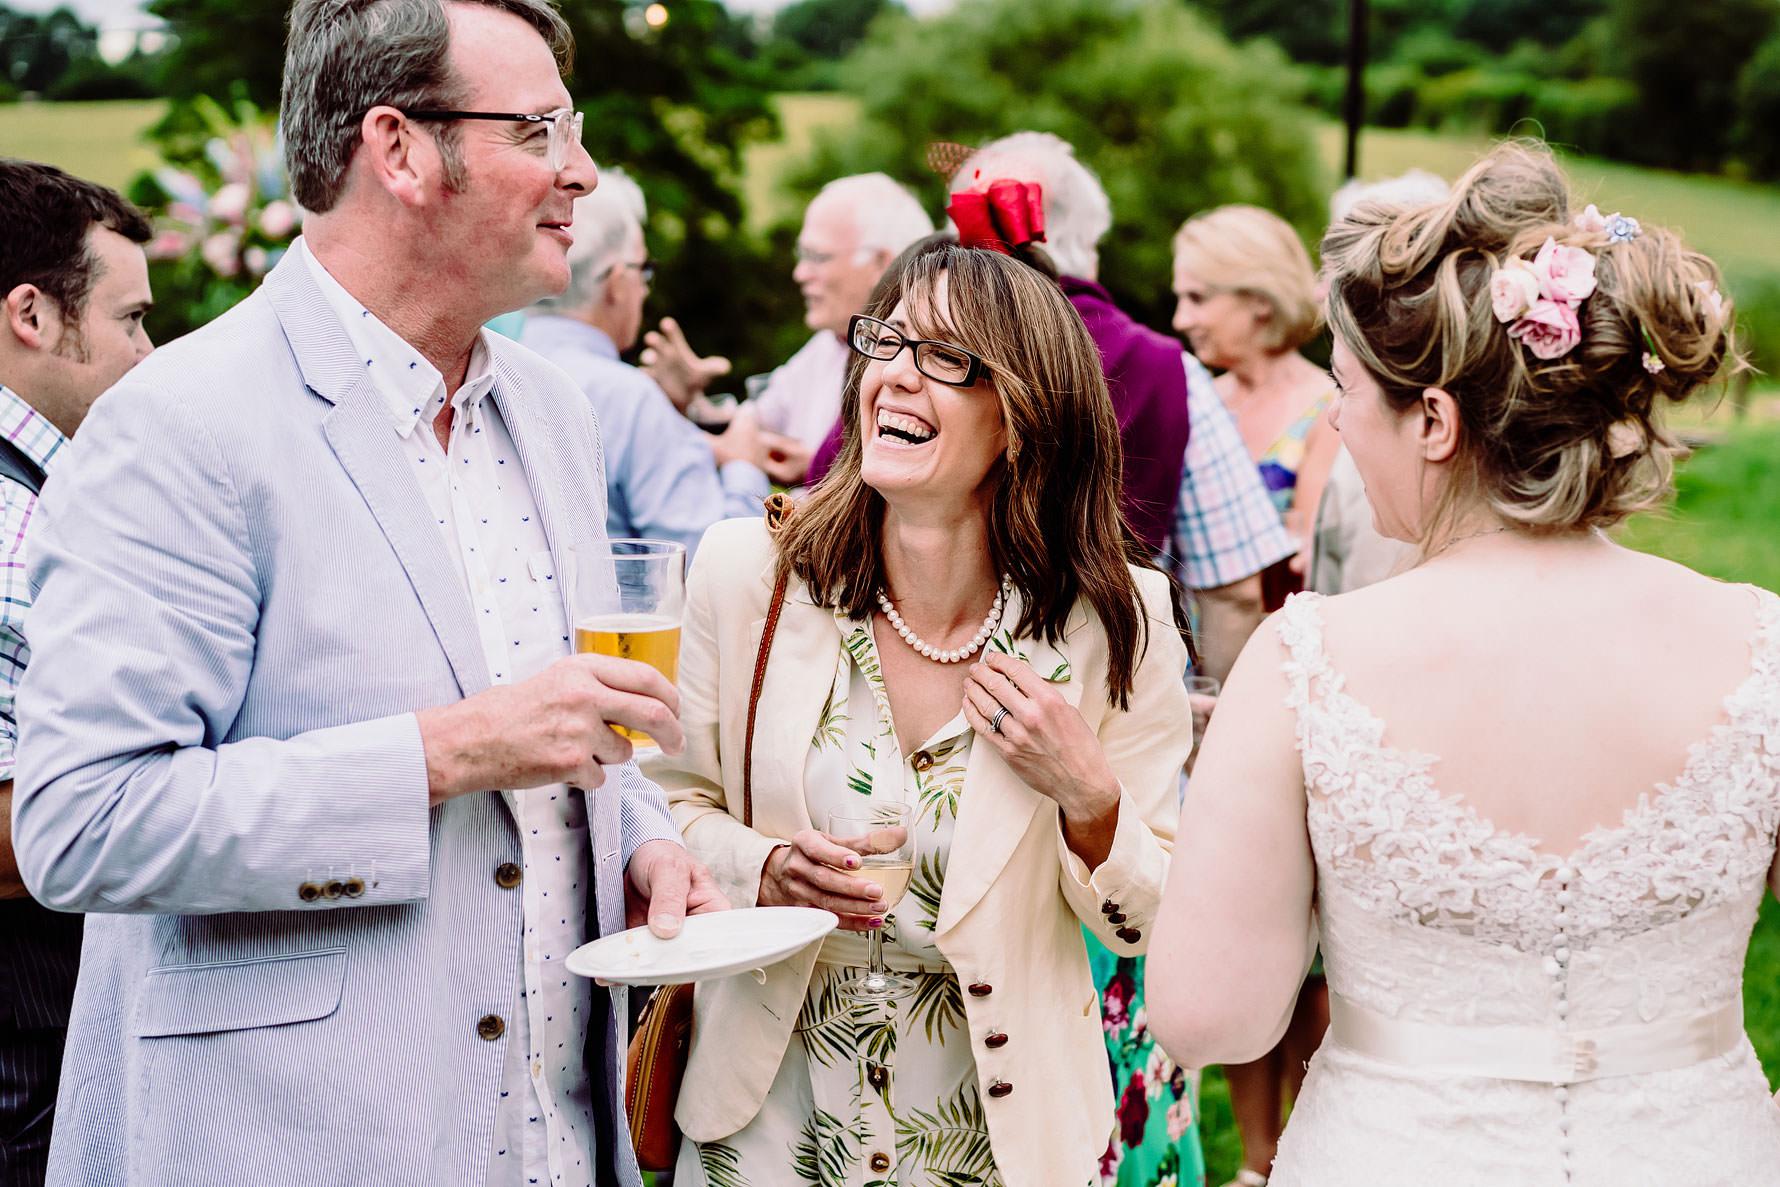 happy guests at a wedding